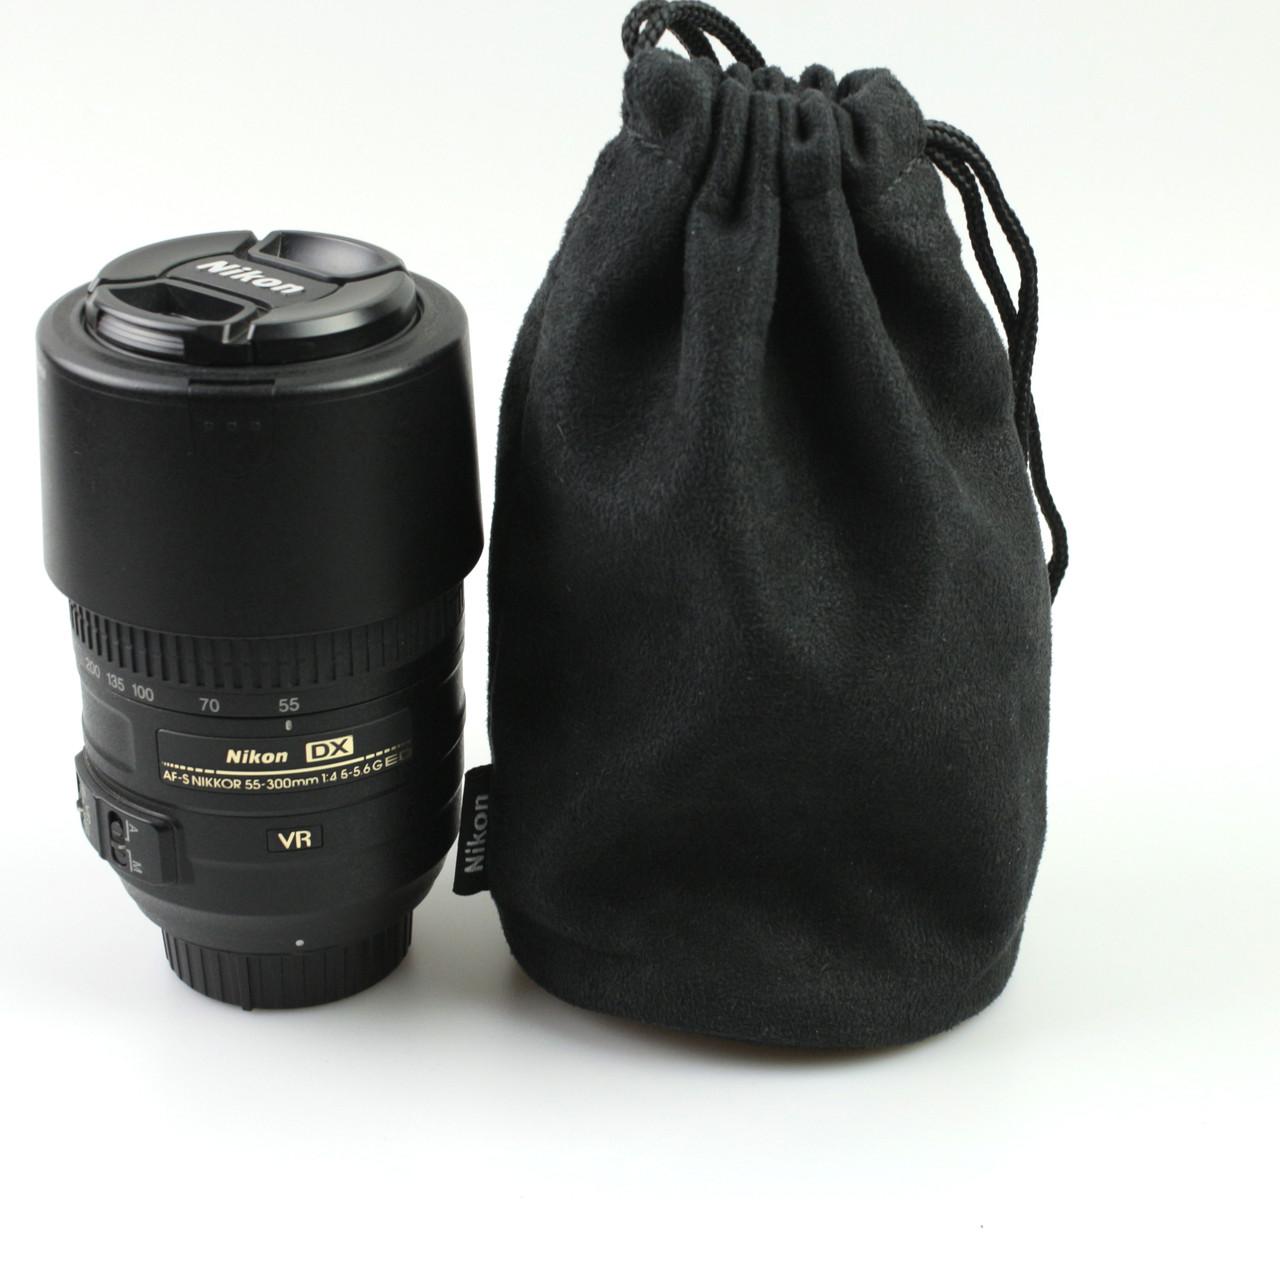 Nikon AF-S 55-300mm F4.5-5.6G ED VR Раскитовка / в магазине